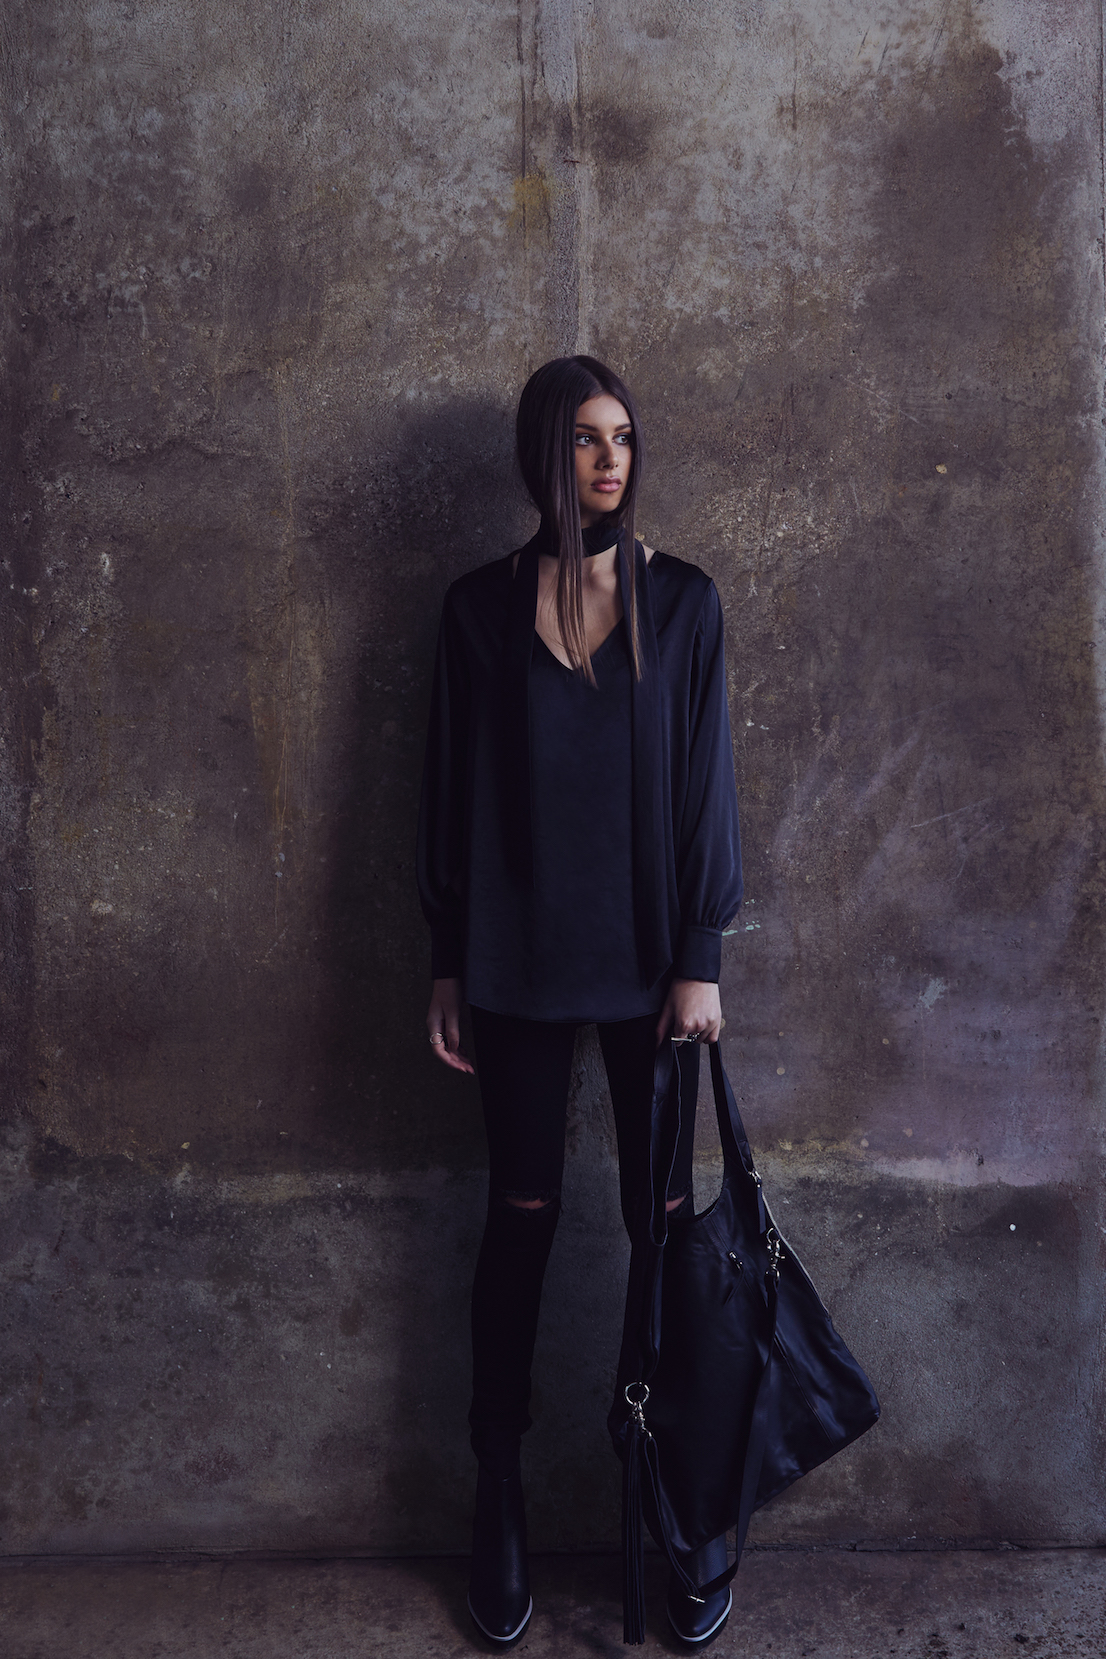 Saskia-Anderson-Moochi-Campaign-Steve-Tilley-014